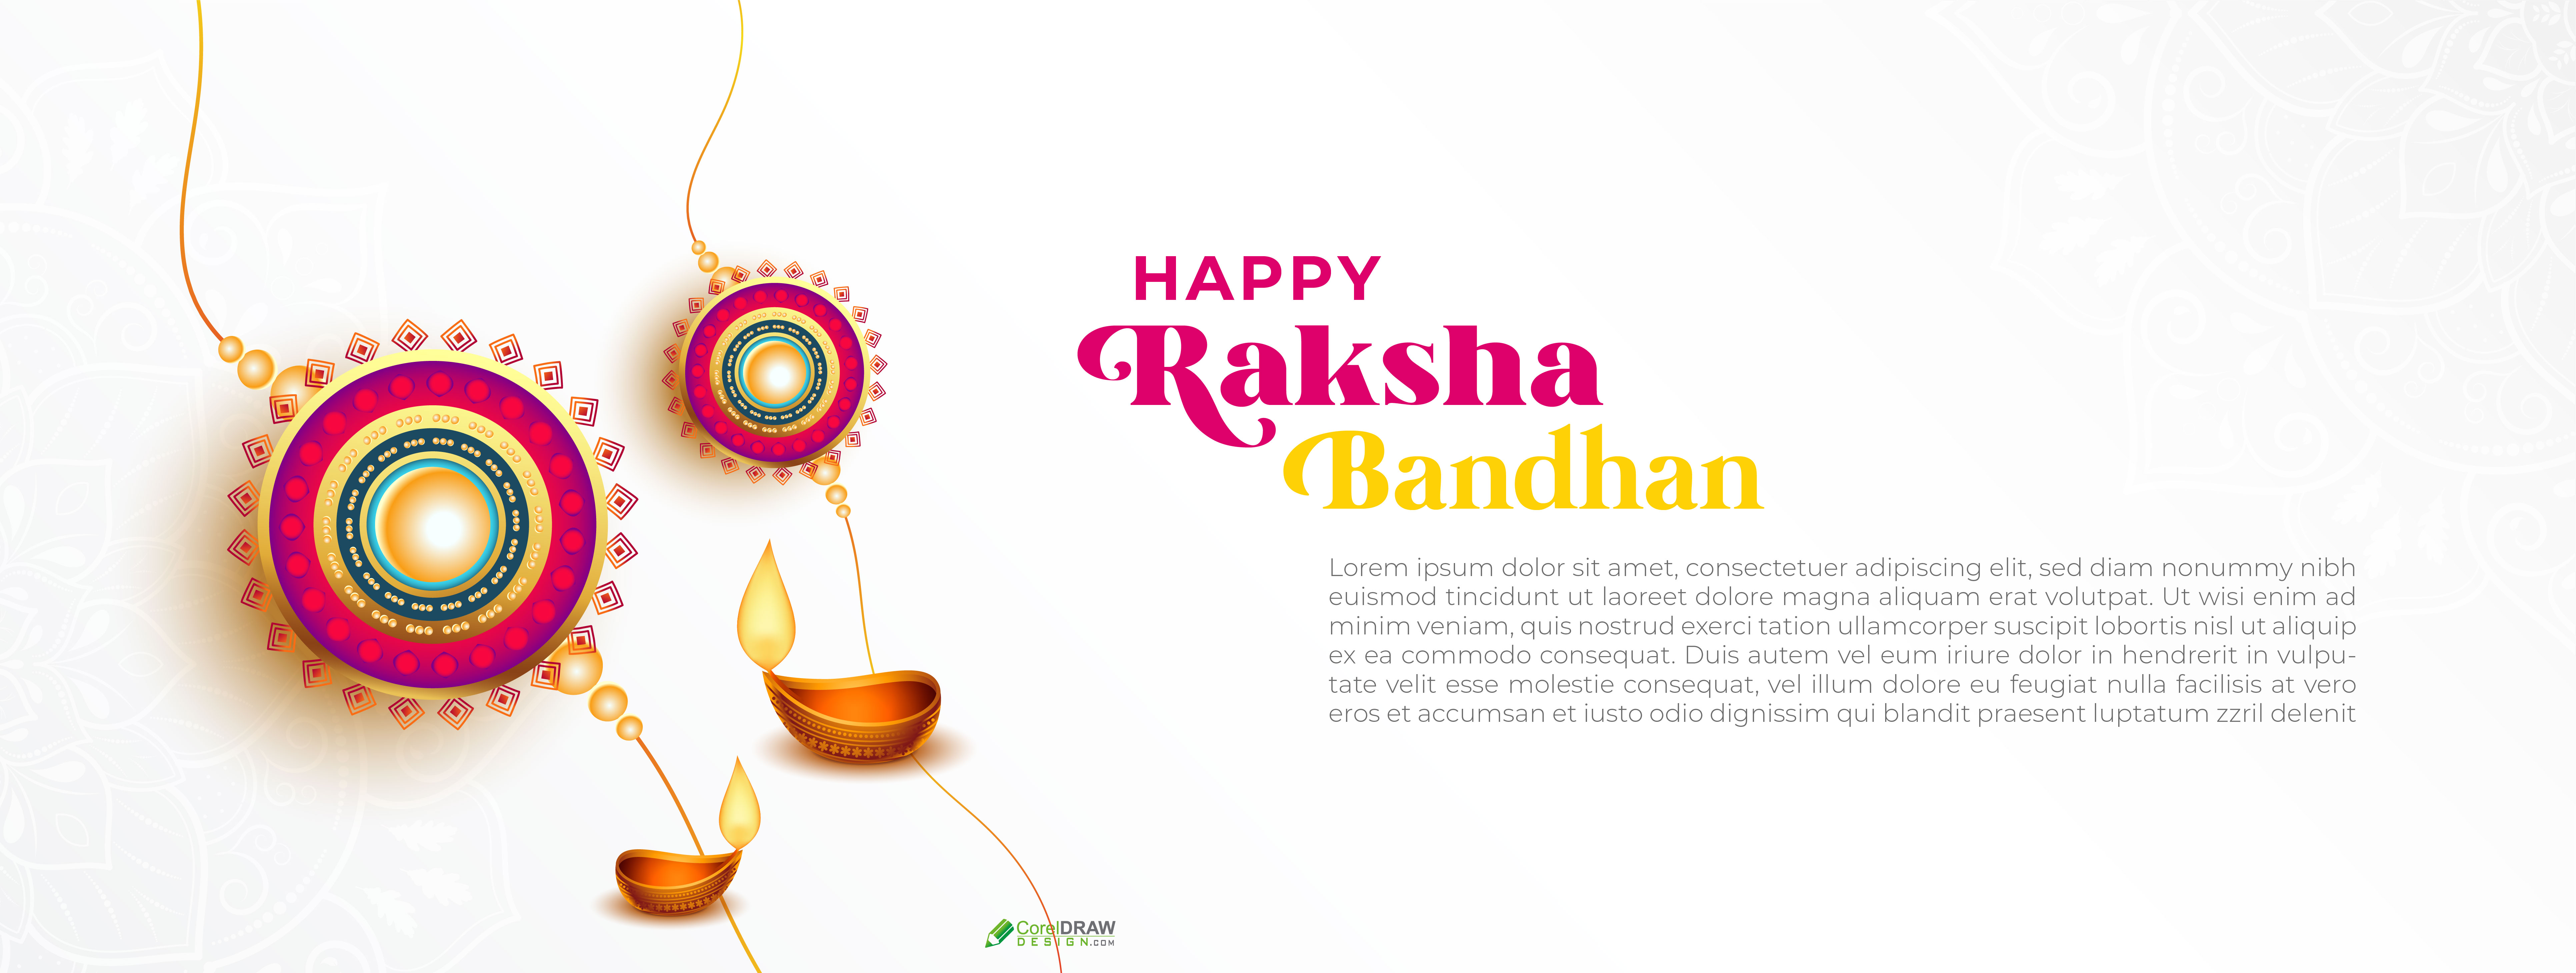 Happy Raksha Bandhan Indian Rakhi Festival Banner Background